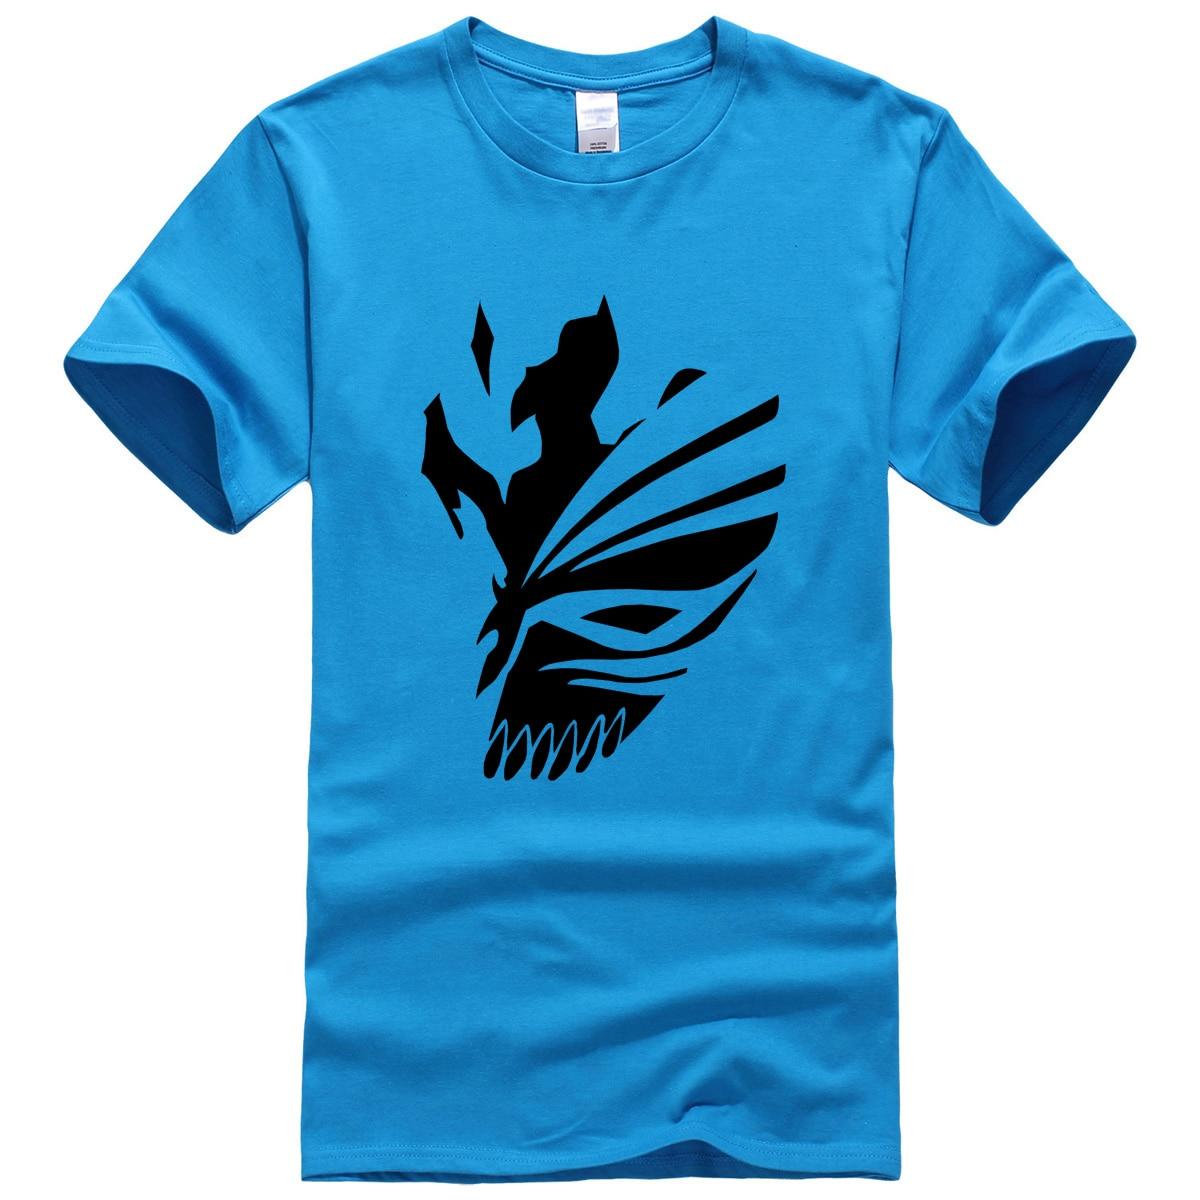 Bleach T-Shirt Anime with Black Print